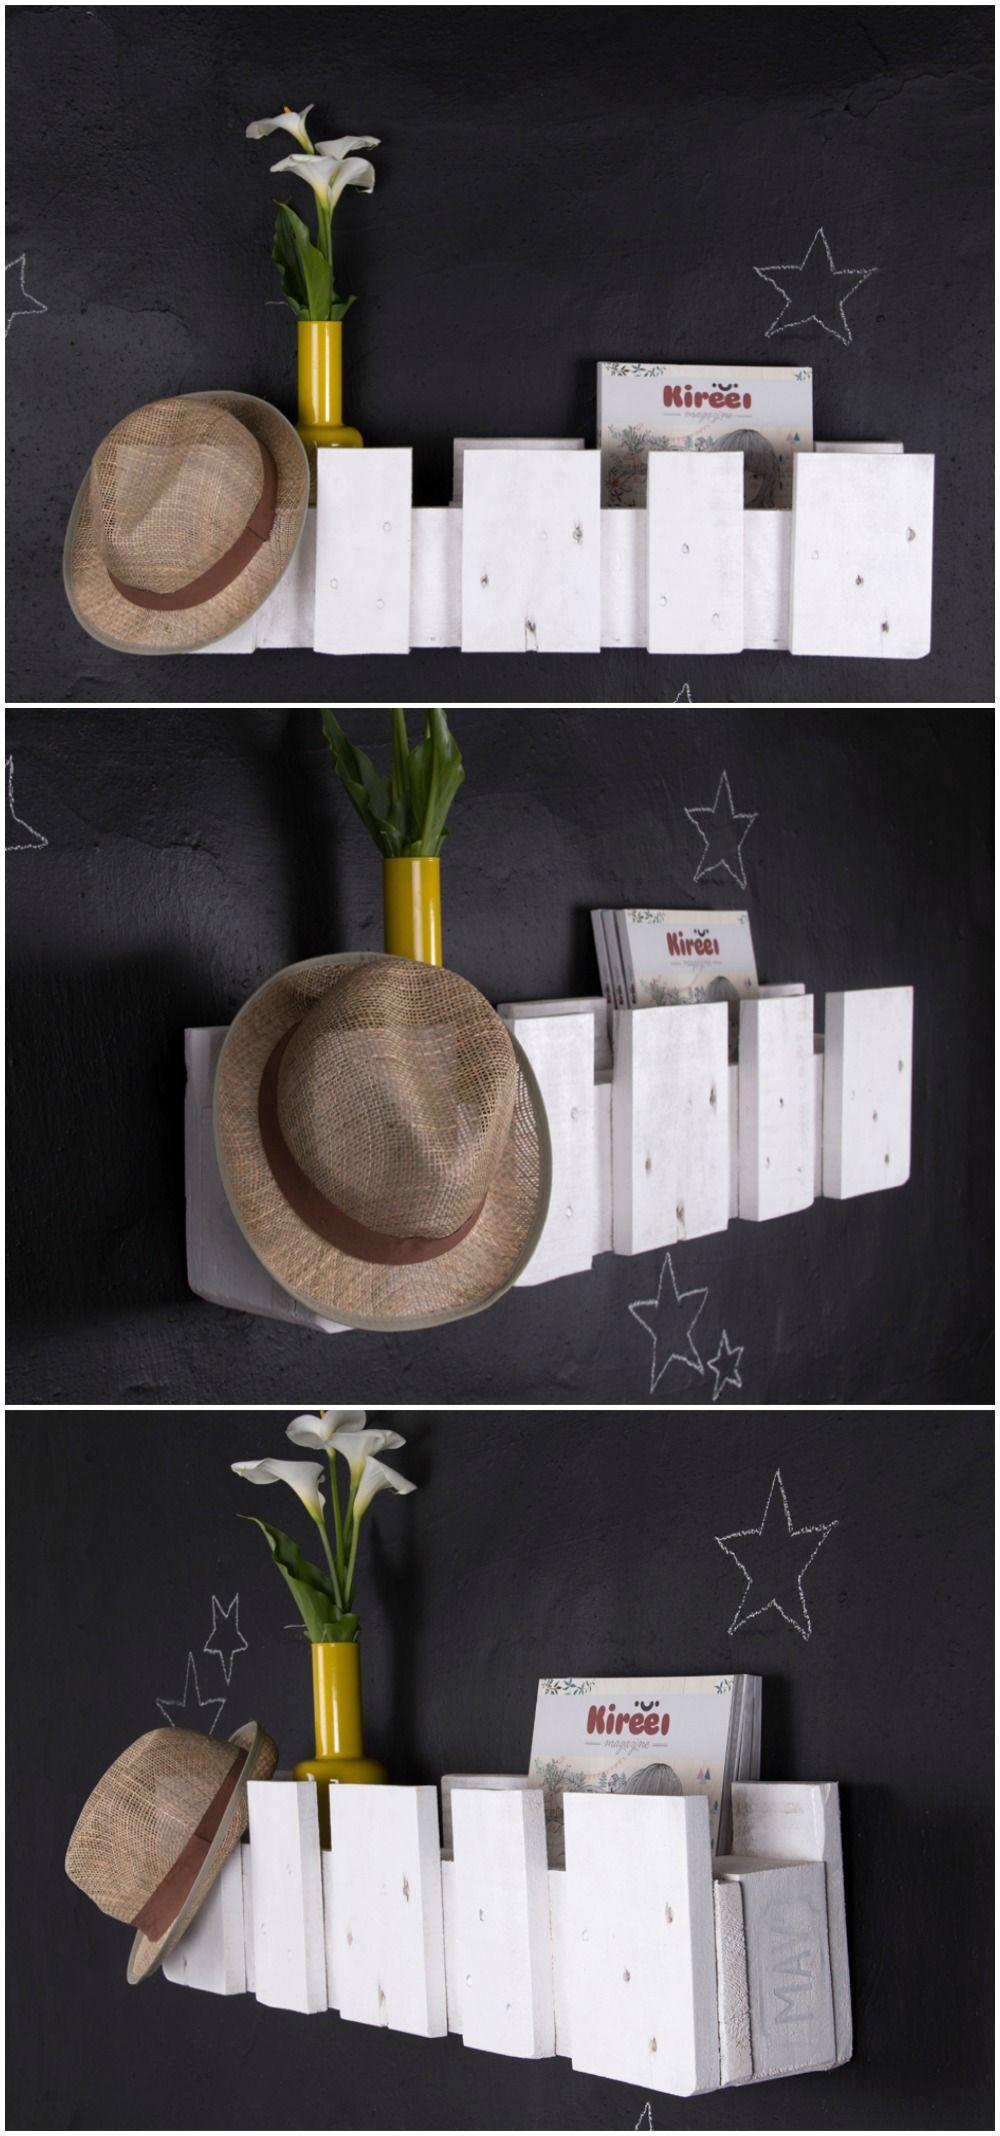 Muebles De Tuya - Estante De Palets Con Ruedas Estante Hecho Con Palets Estanter A [mjhdah]https://www.moblerone.es/wp-content/uploads/2016/04/Promocion-dia-de-la-madre-ok-horizontal-2.jpg